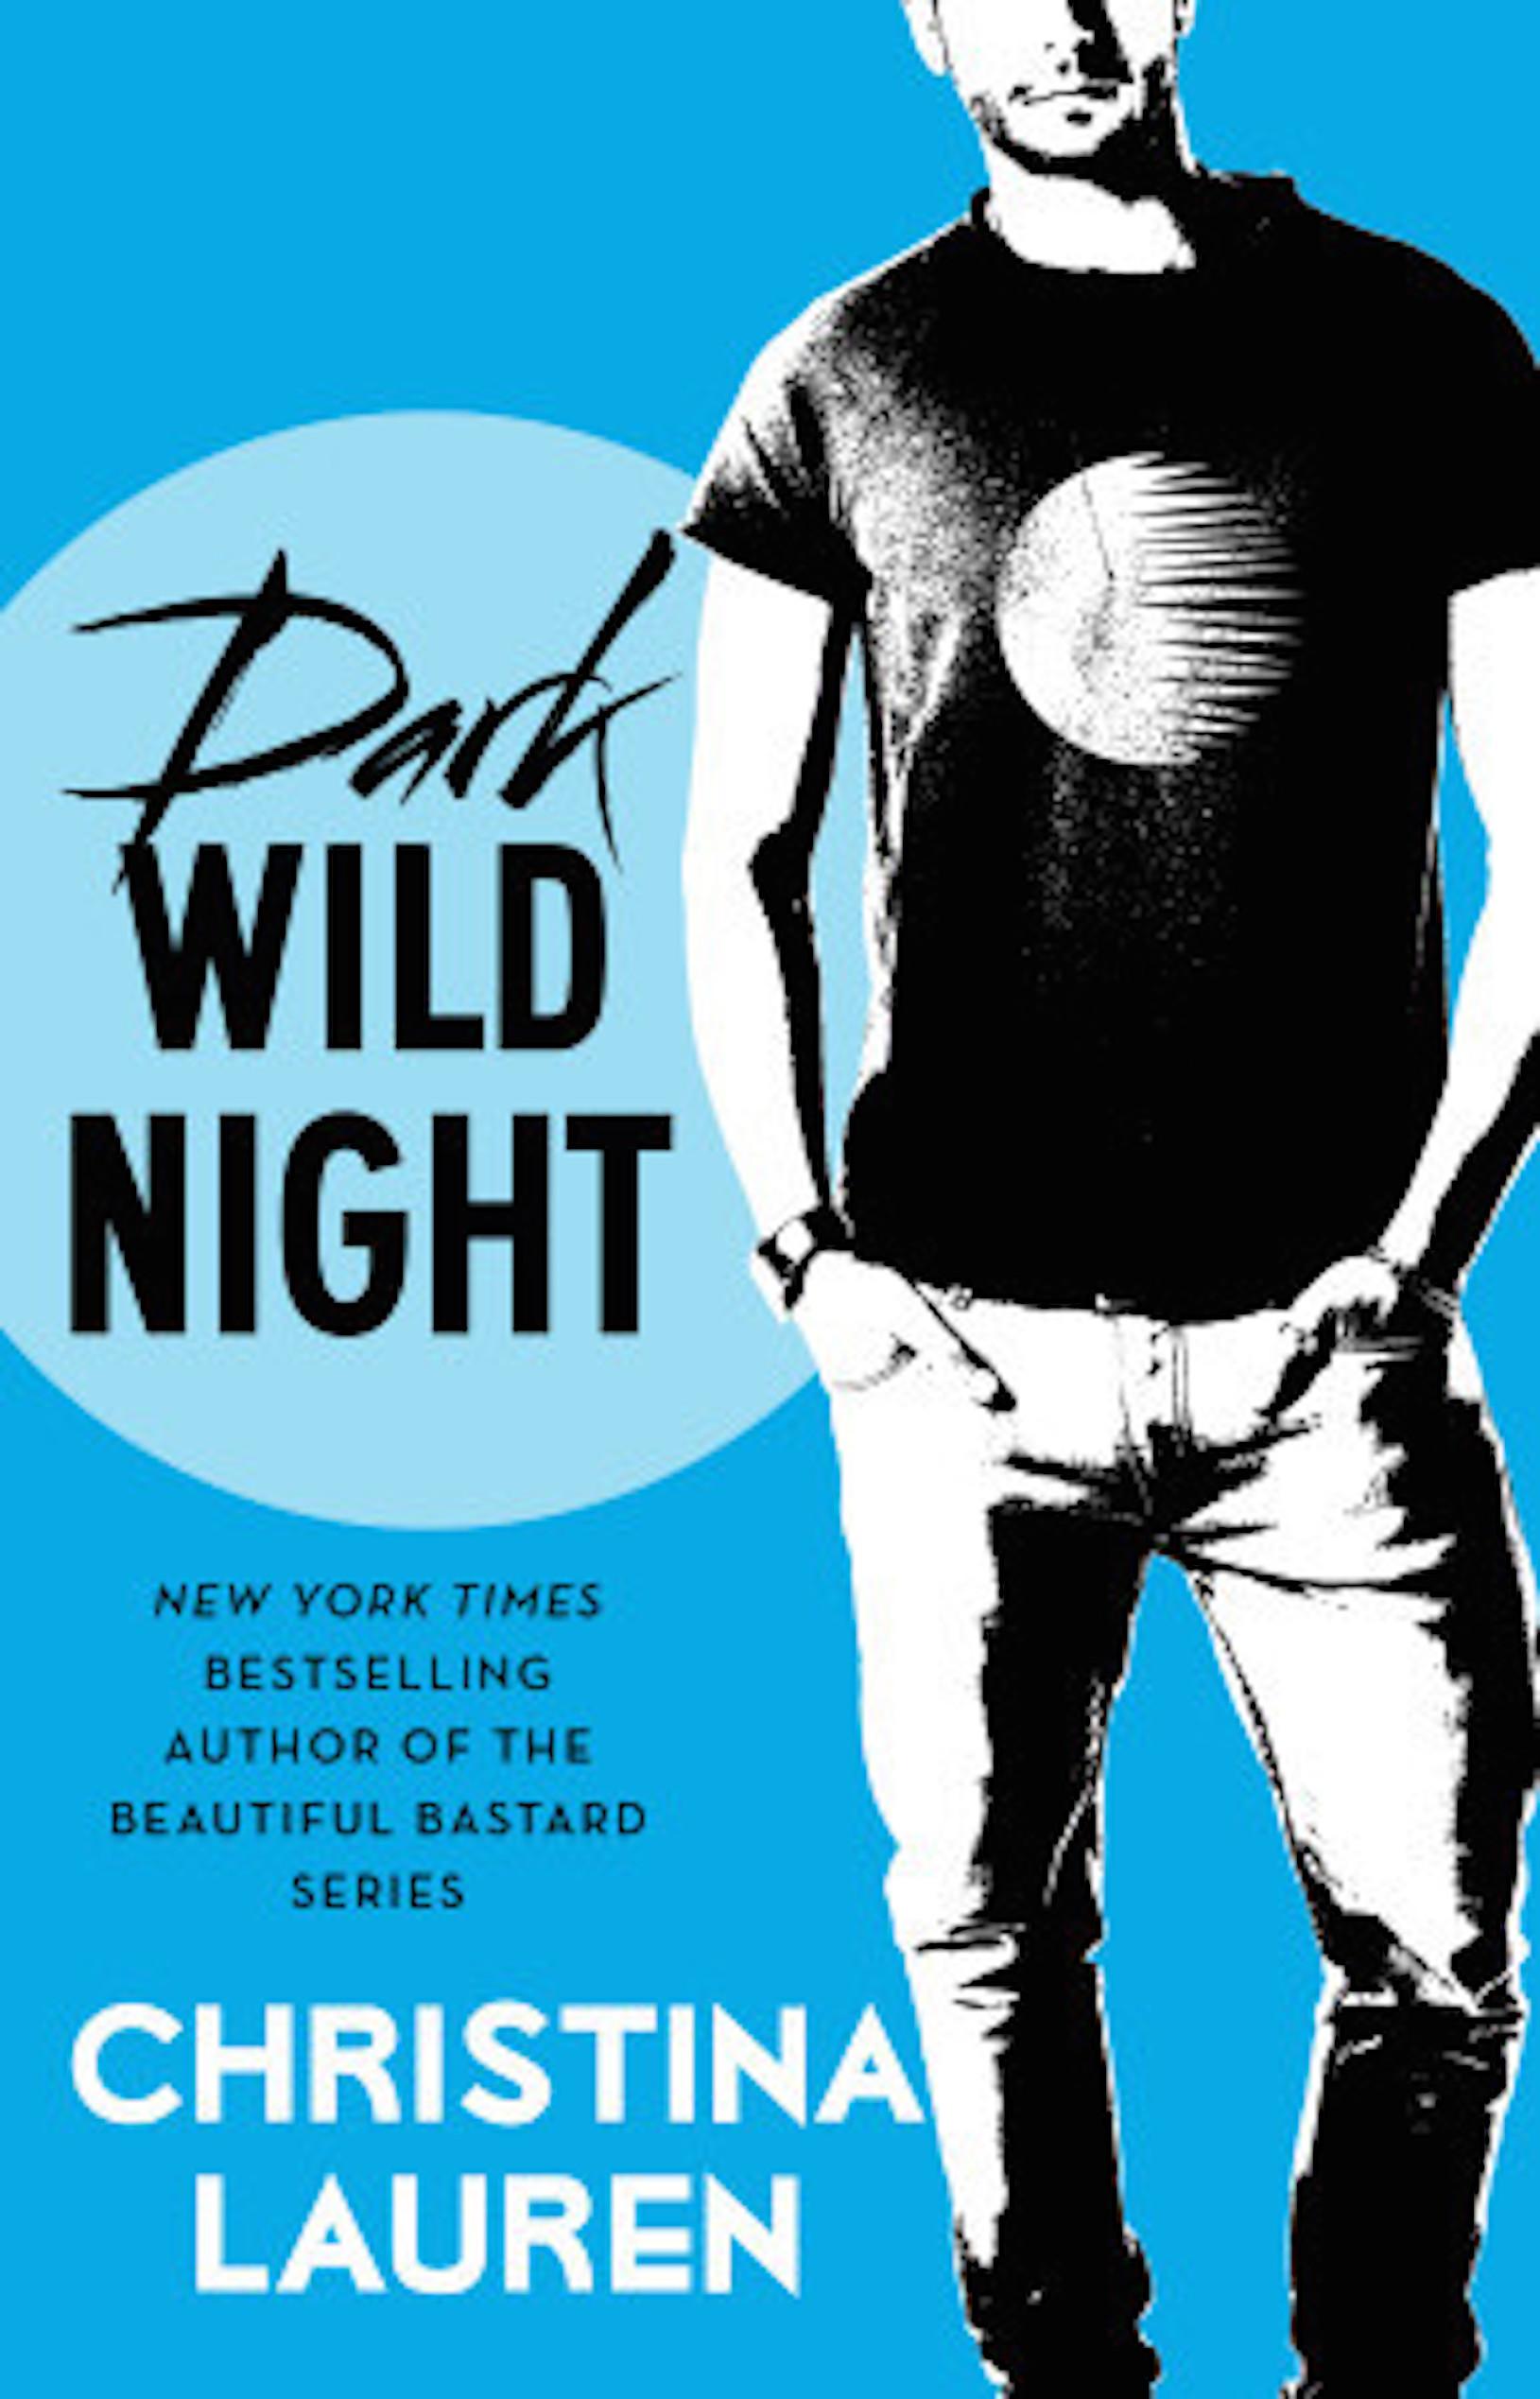 Review_Dark Wild Night By Christina Lauren